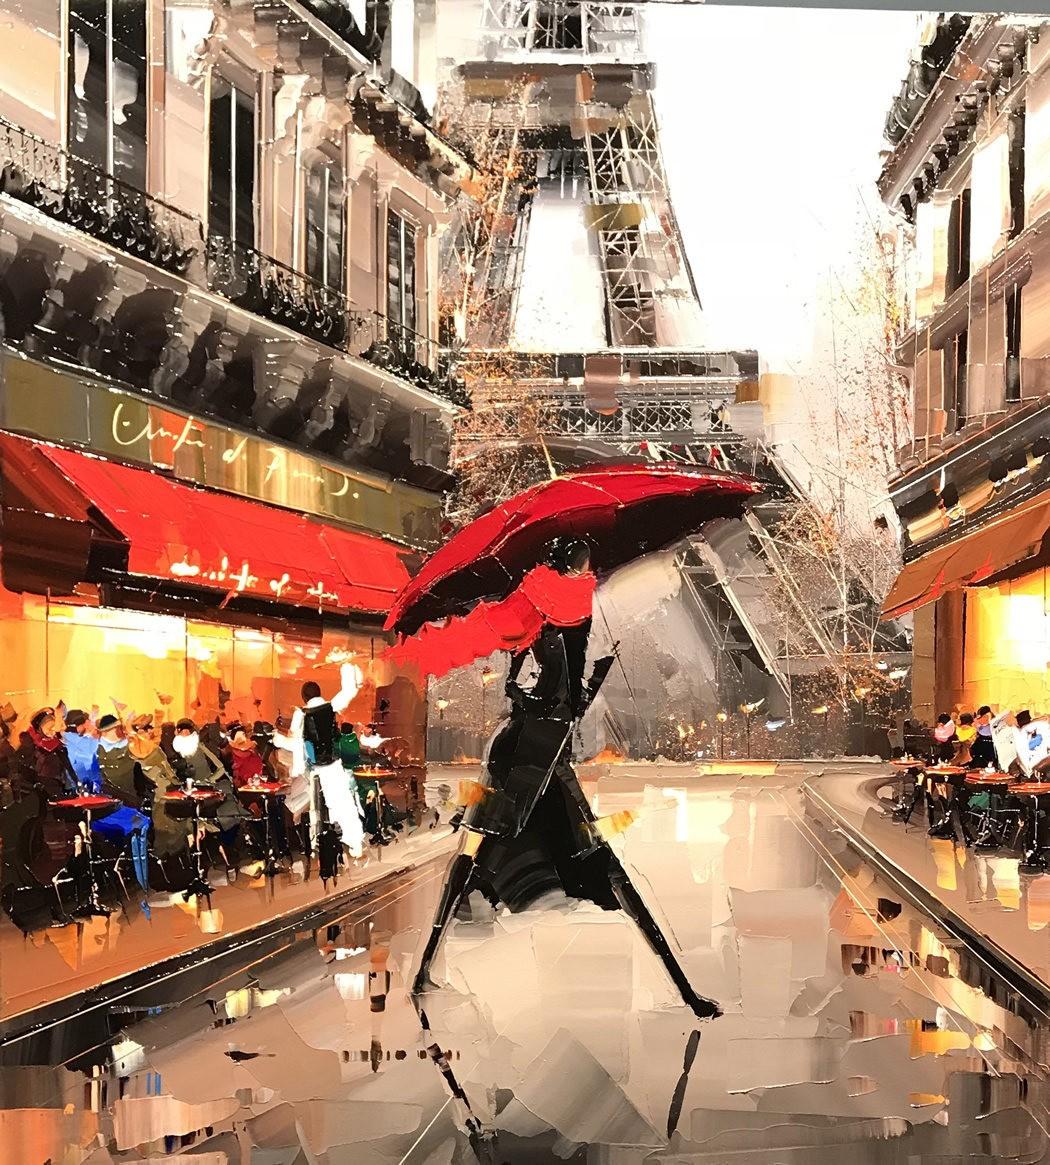 Kal Gajoum 的油画_图1-2